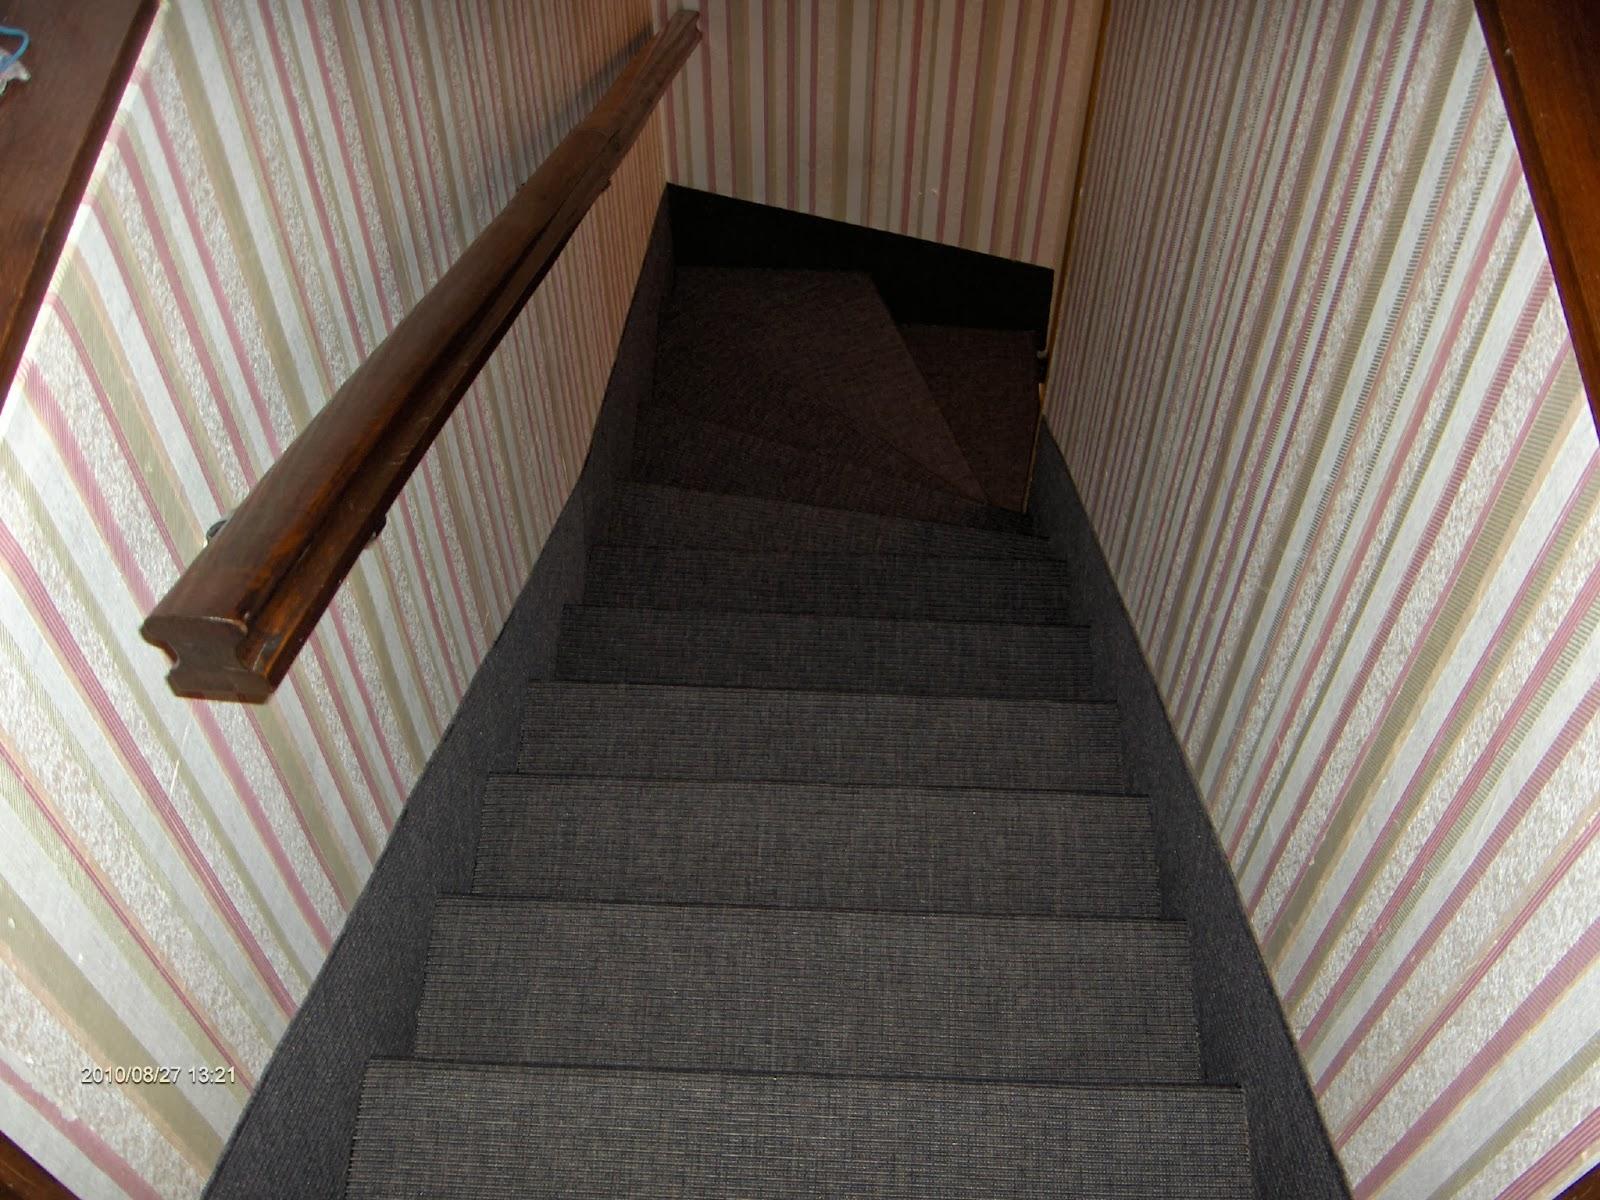 travaux ch 232 que emploi service habiller un escalier en b 233 ton